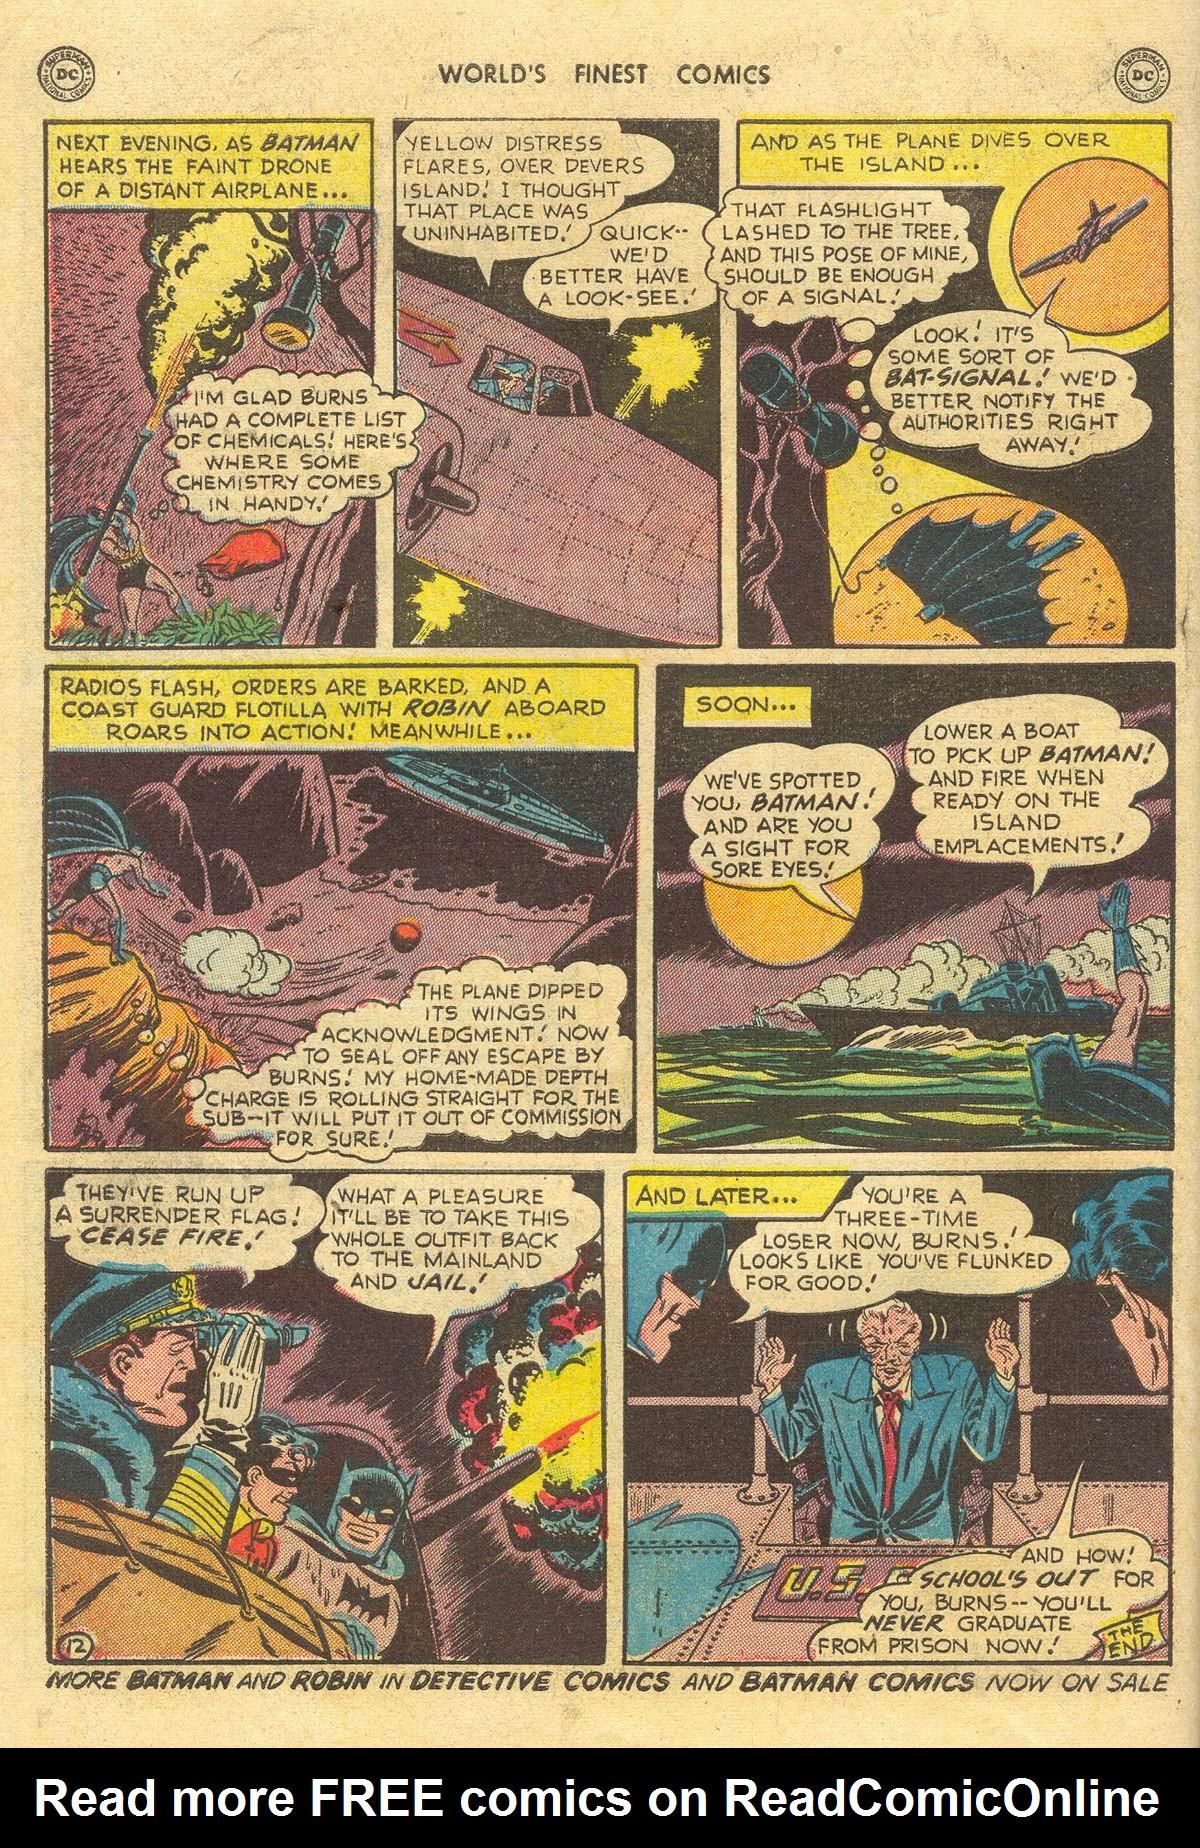 Read online World's Finest Comics comic -  Issue #51 - 74